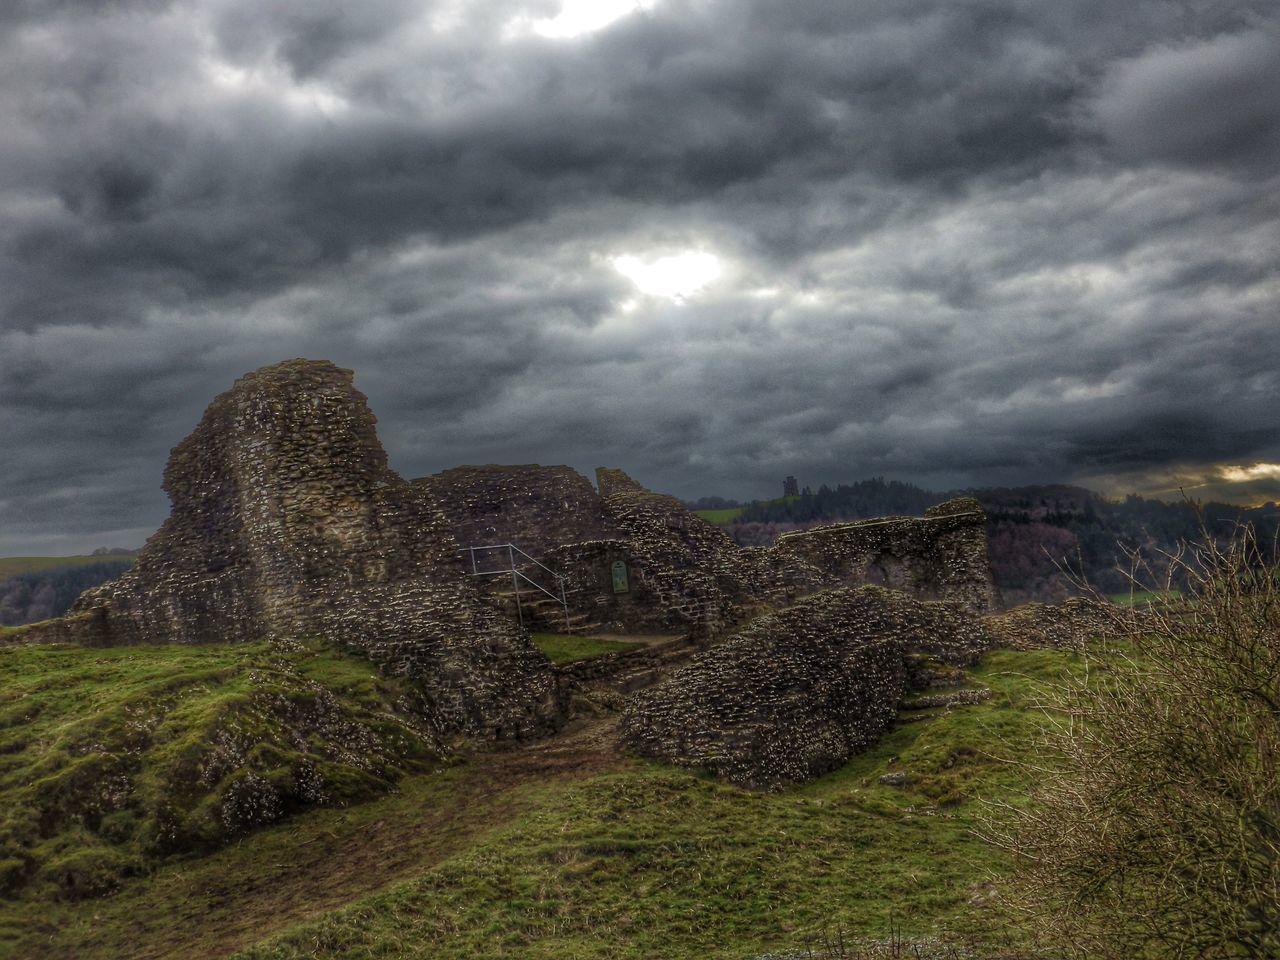 Ruins Rocks Grey Green Landscape Castle Walls Grey Sky Dramatic Moody Atmospheric